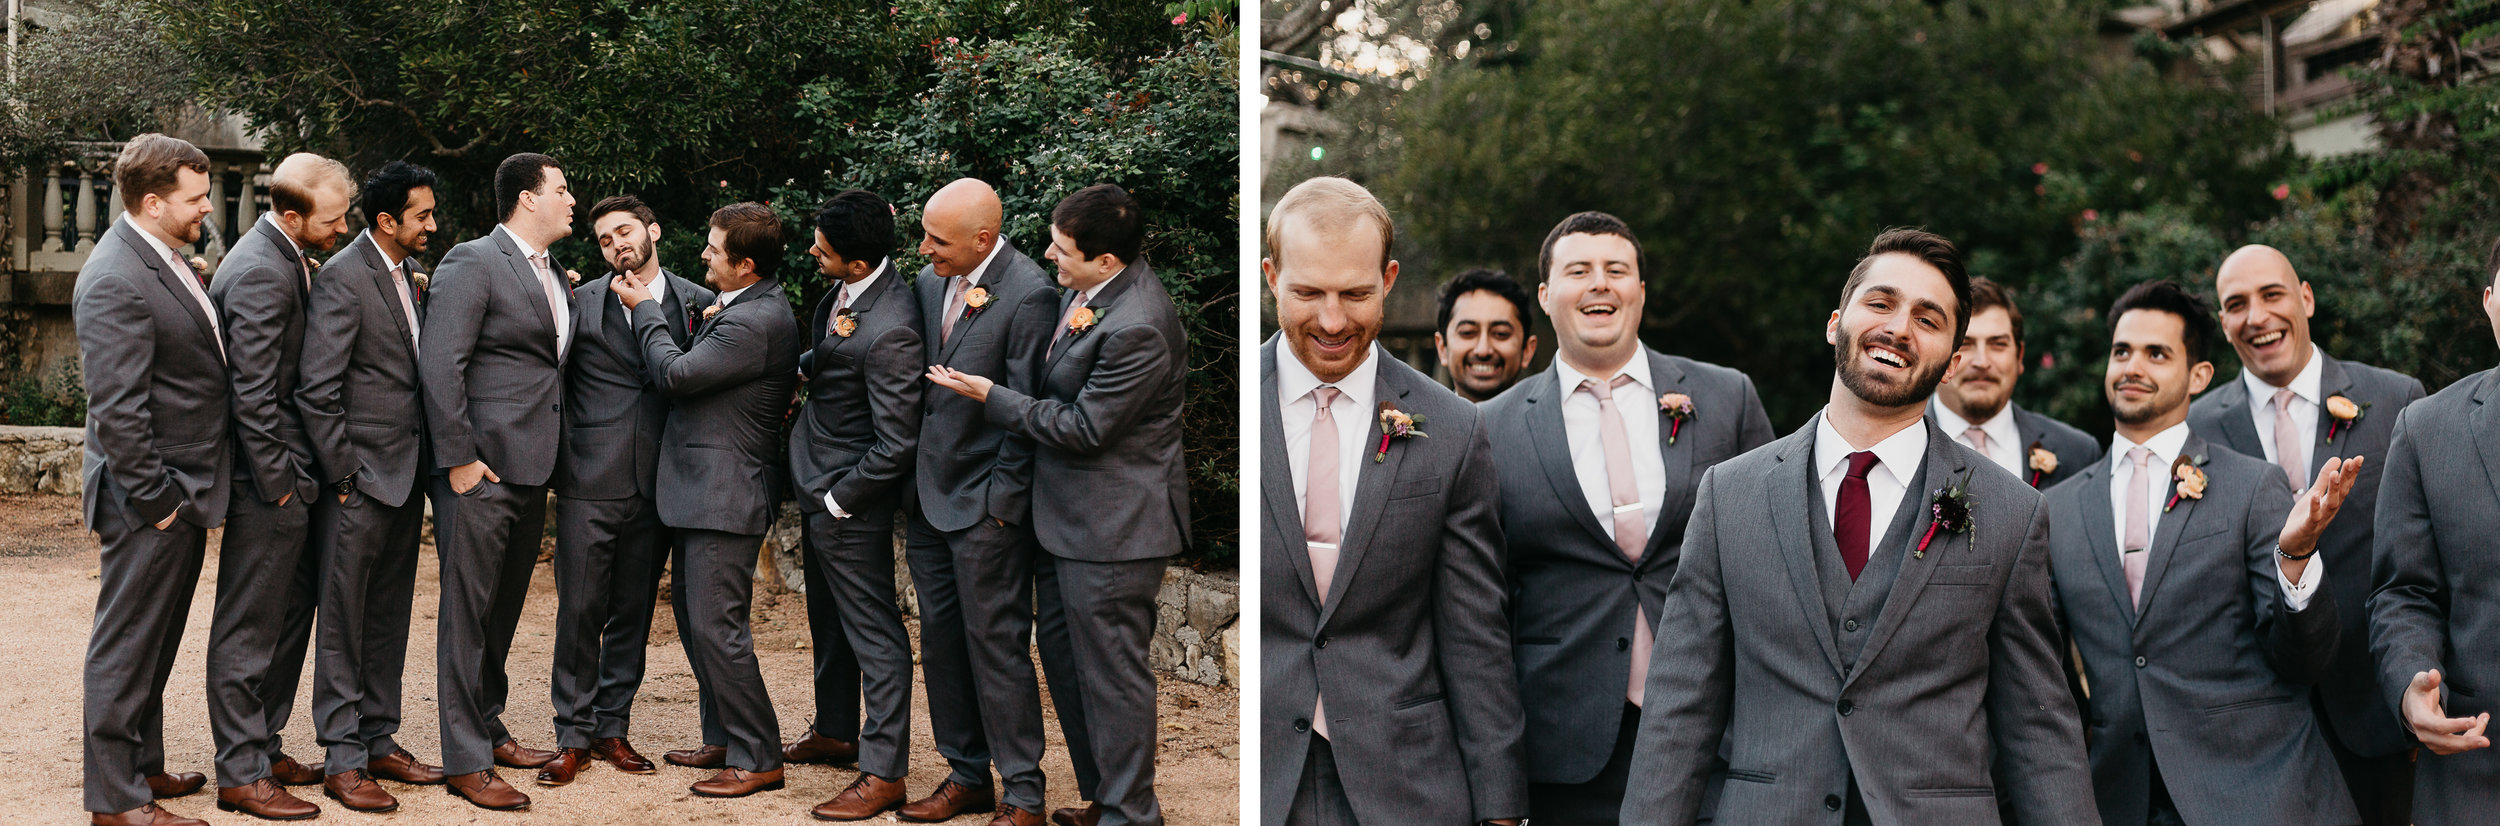 austin texas wedding photogapher elopement photographer villa antonia austin 3.jpg